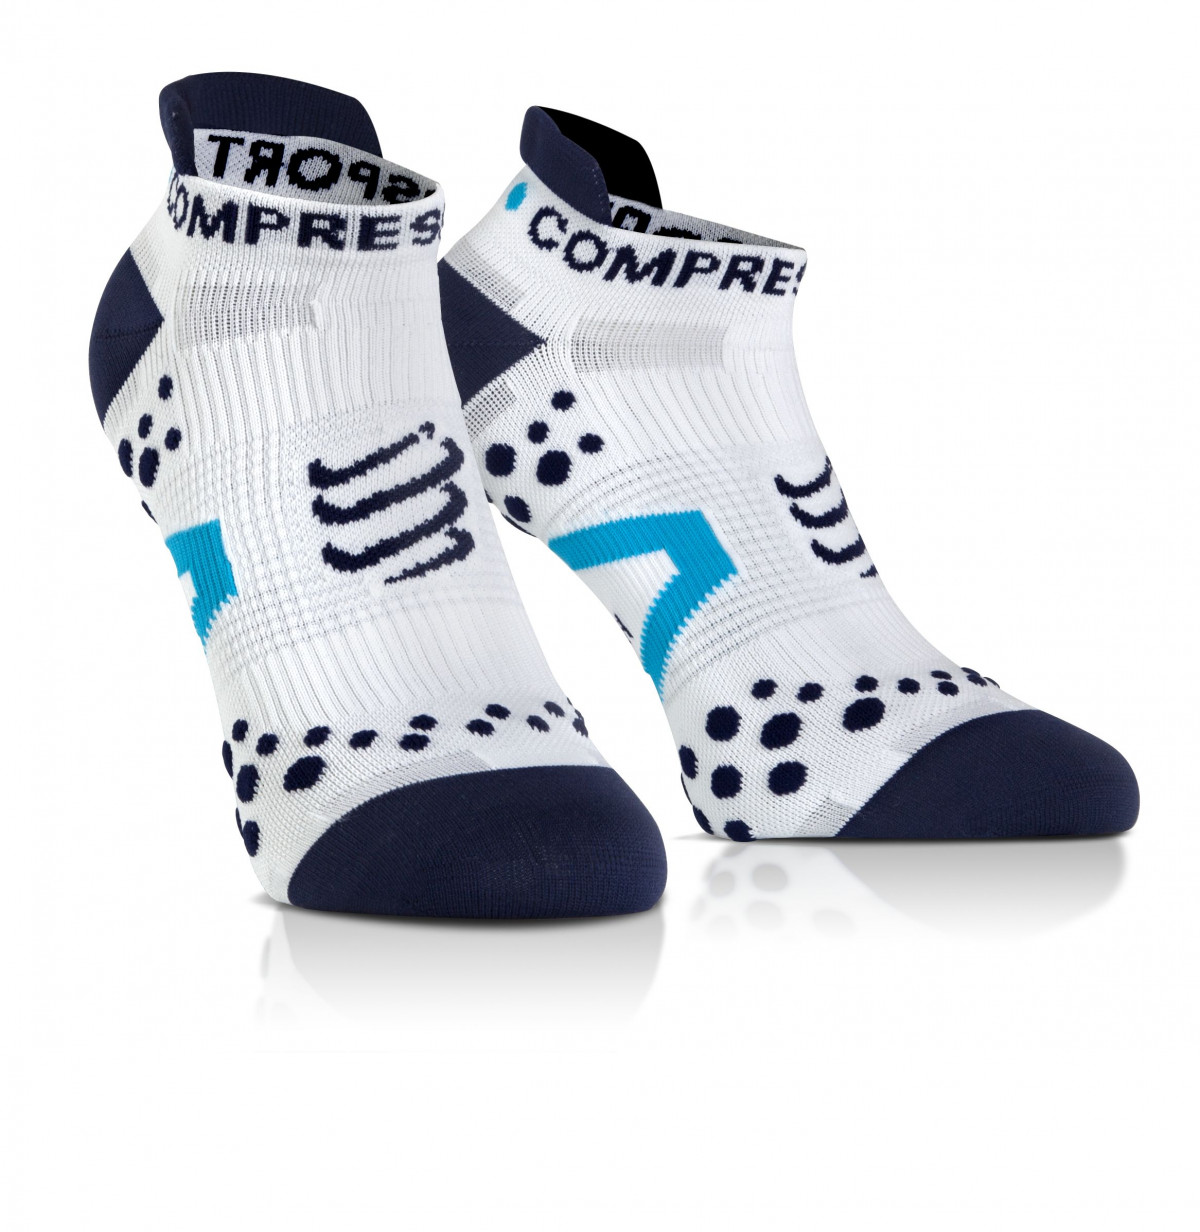 Compressport Pro Racing V2 1 Bike Lo Compressiesokken